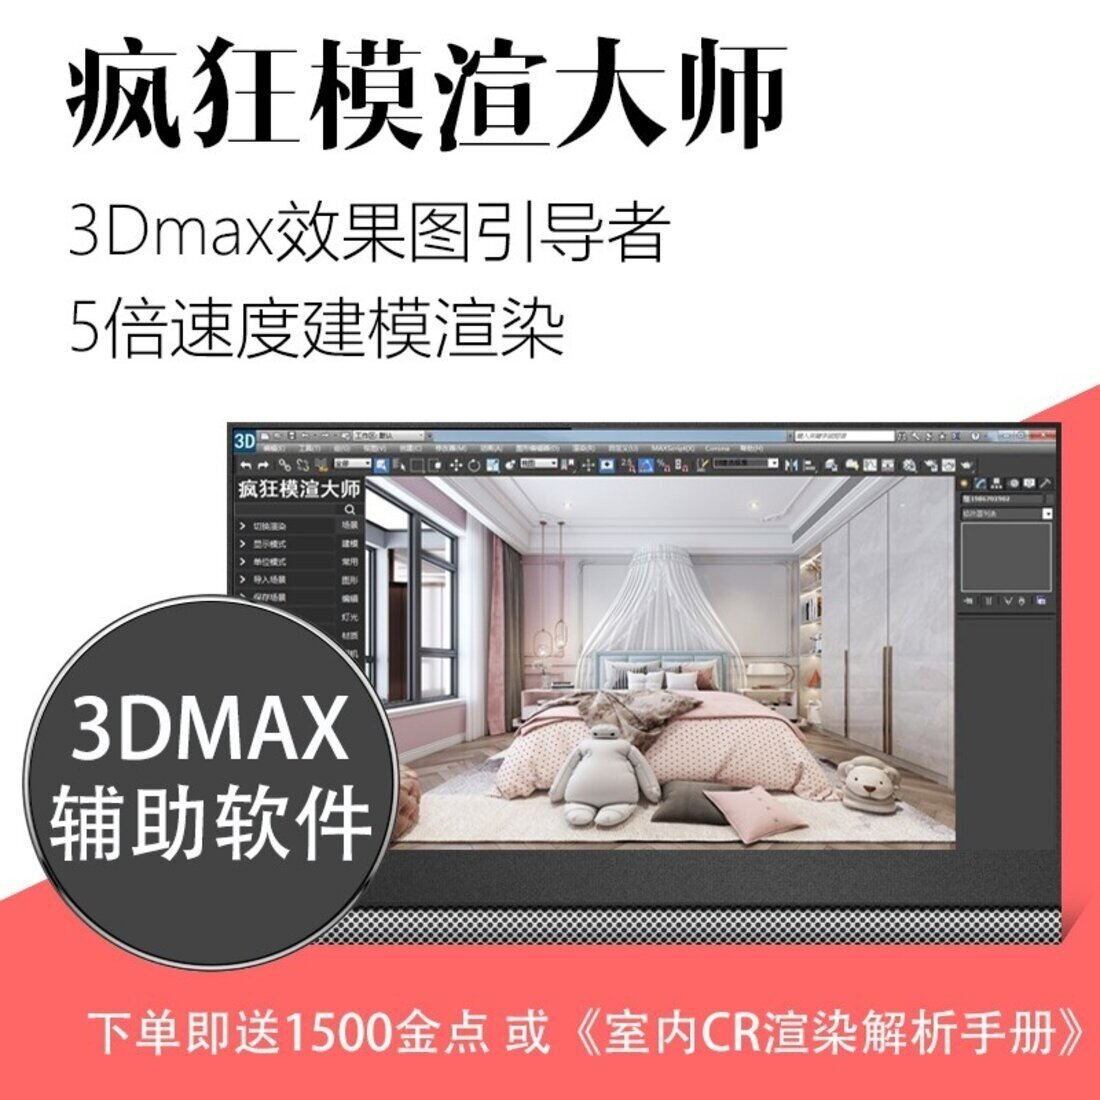 《3DMAX疯狂模渲大师》